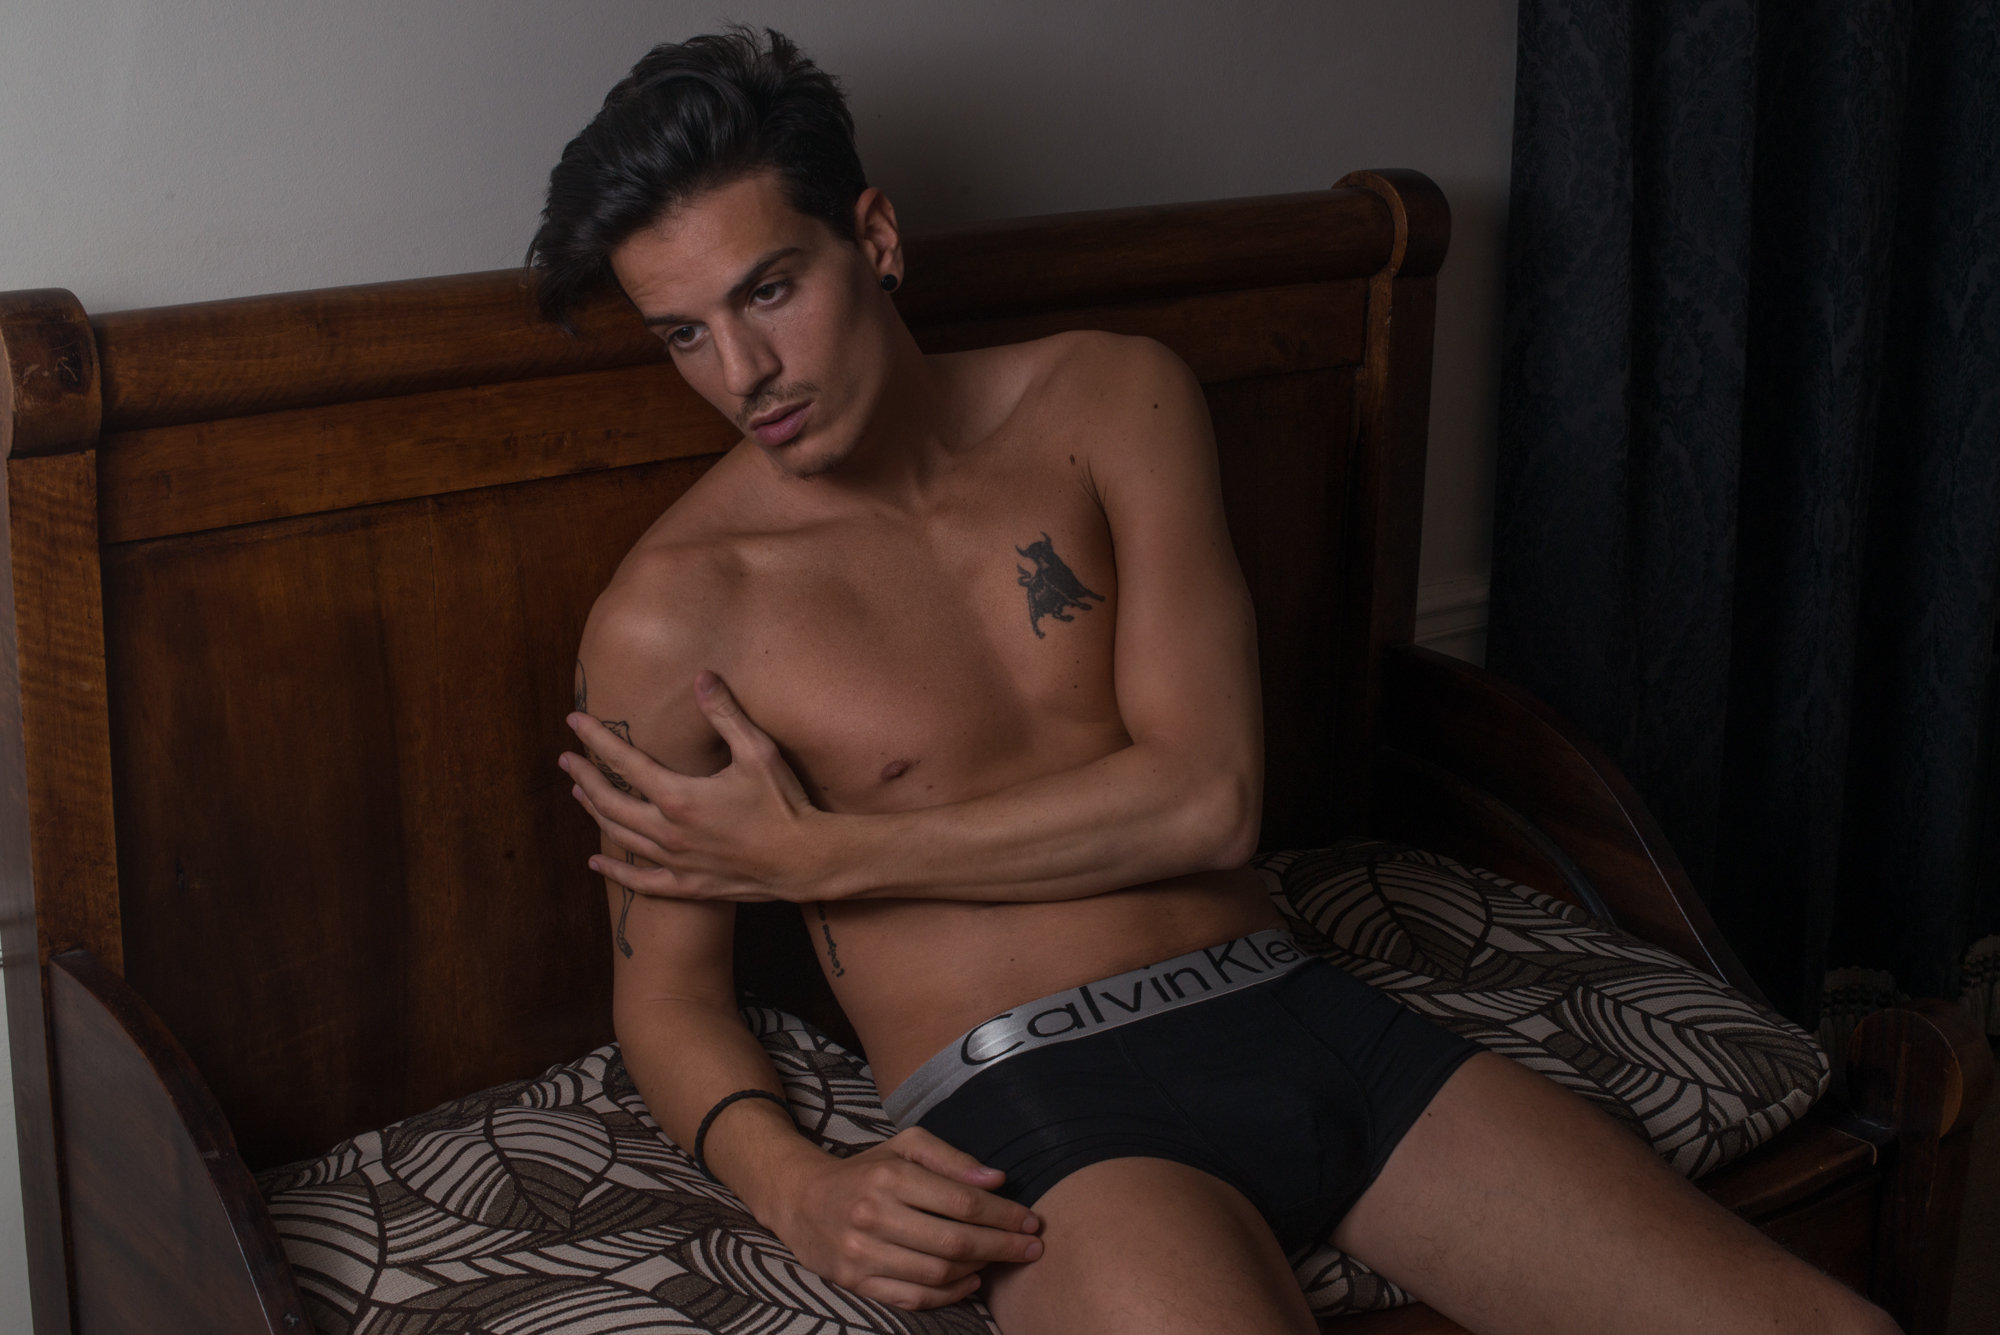 patrick-rivera-portrait-anthony-herrero-sole-intimacy-photographer-patrickrivera (3 of 4).jpg